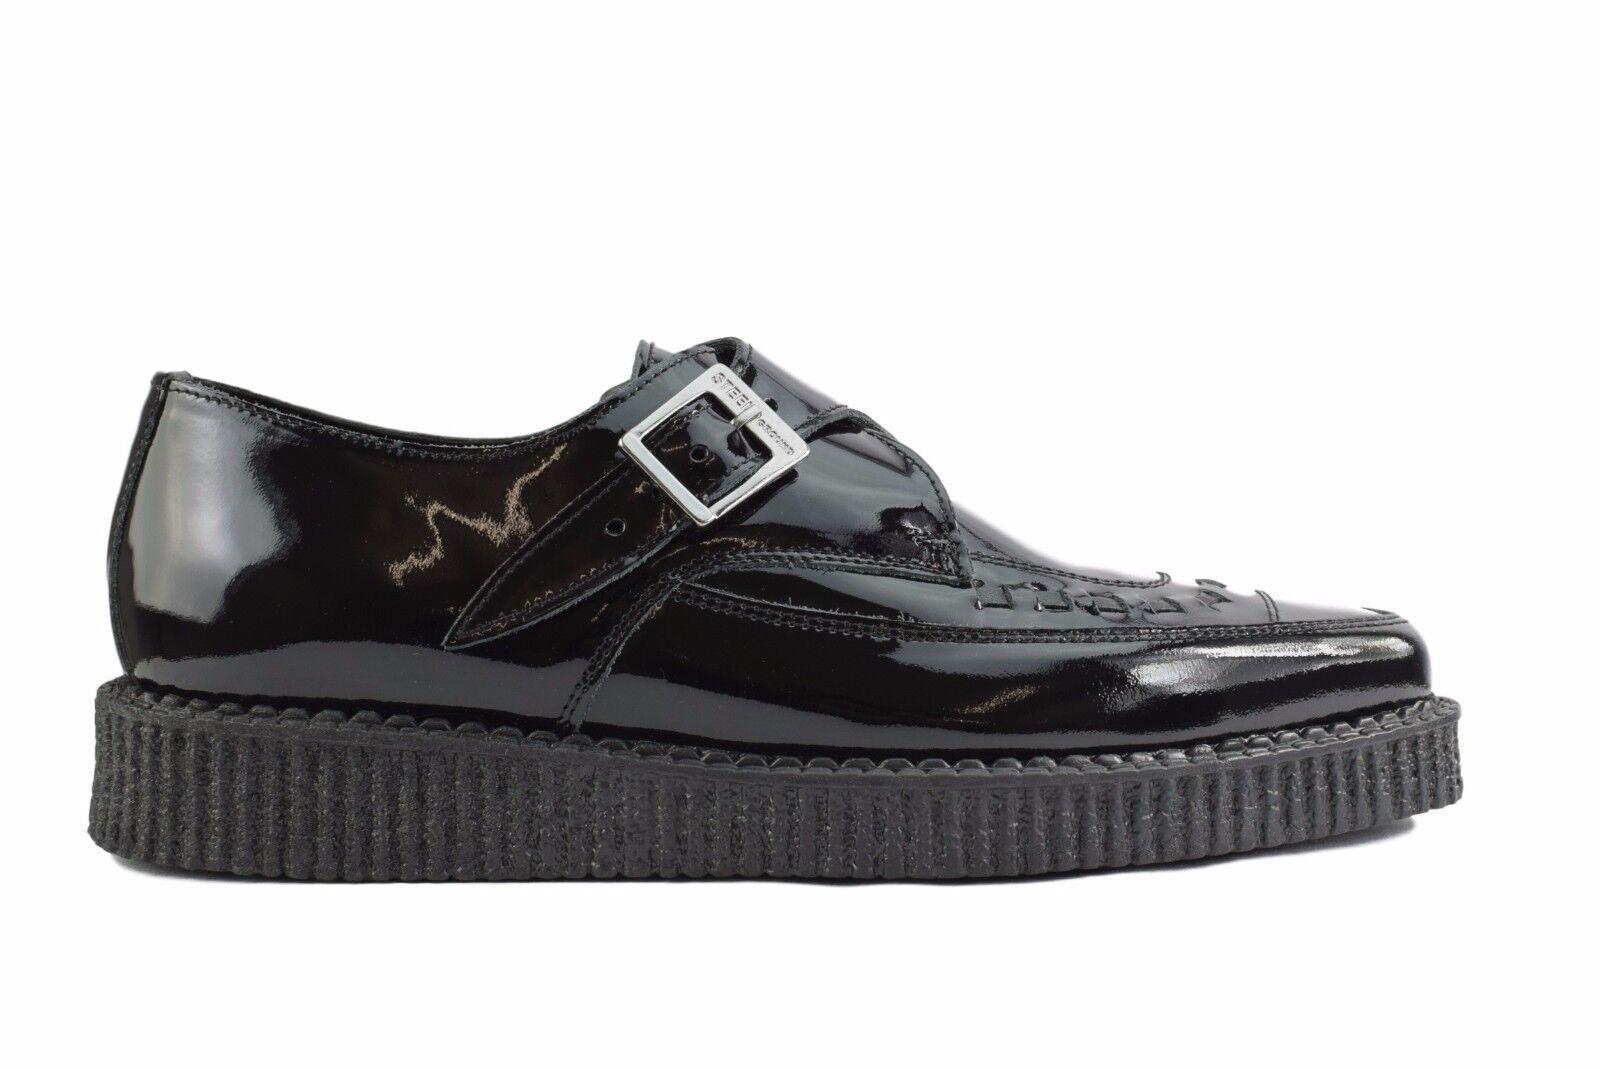 Scarpe di terra in acciaio nera pelle verniciata Creepers Monk Sc200Z175 Buckle A Punta Sc200Z175 Monk ccd32c